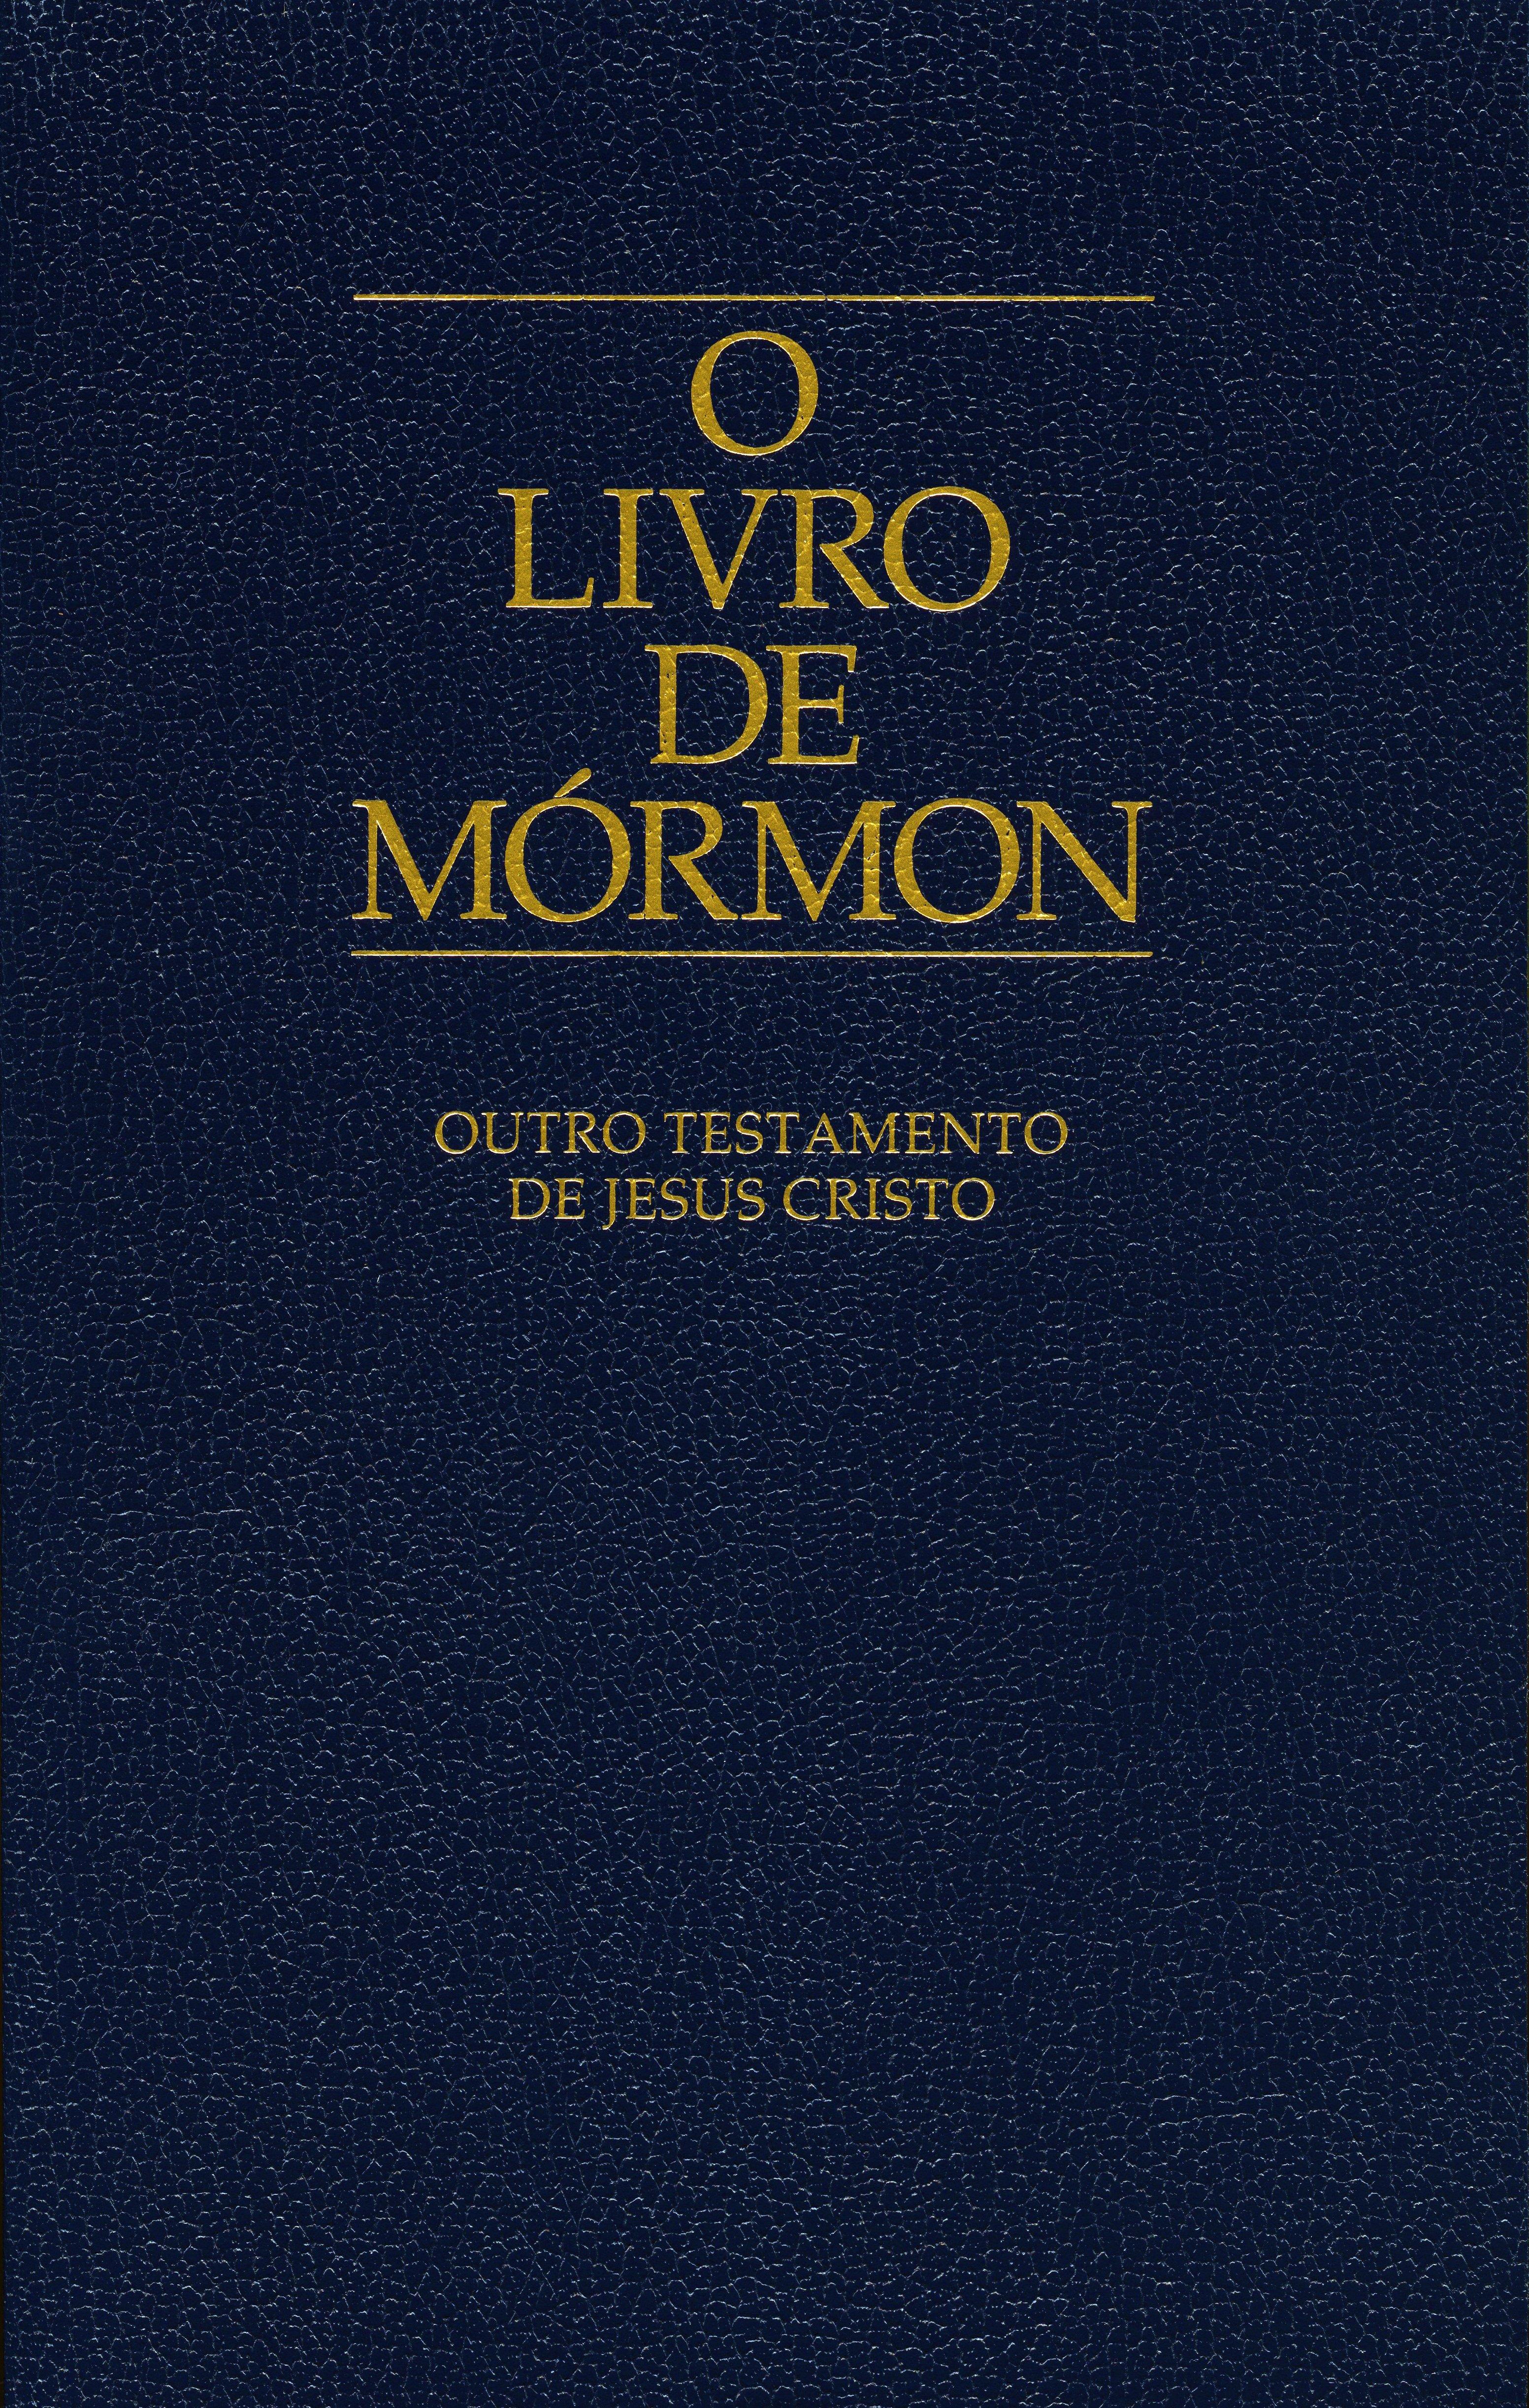 O_livro_de_mormon